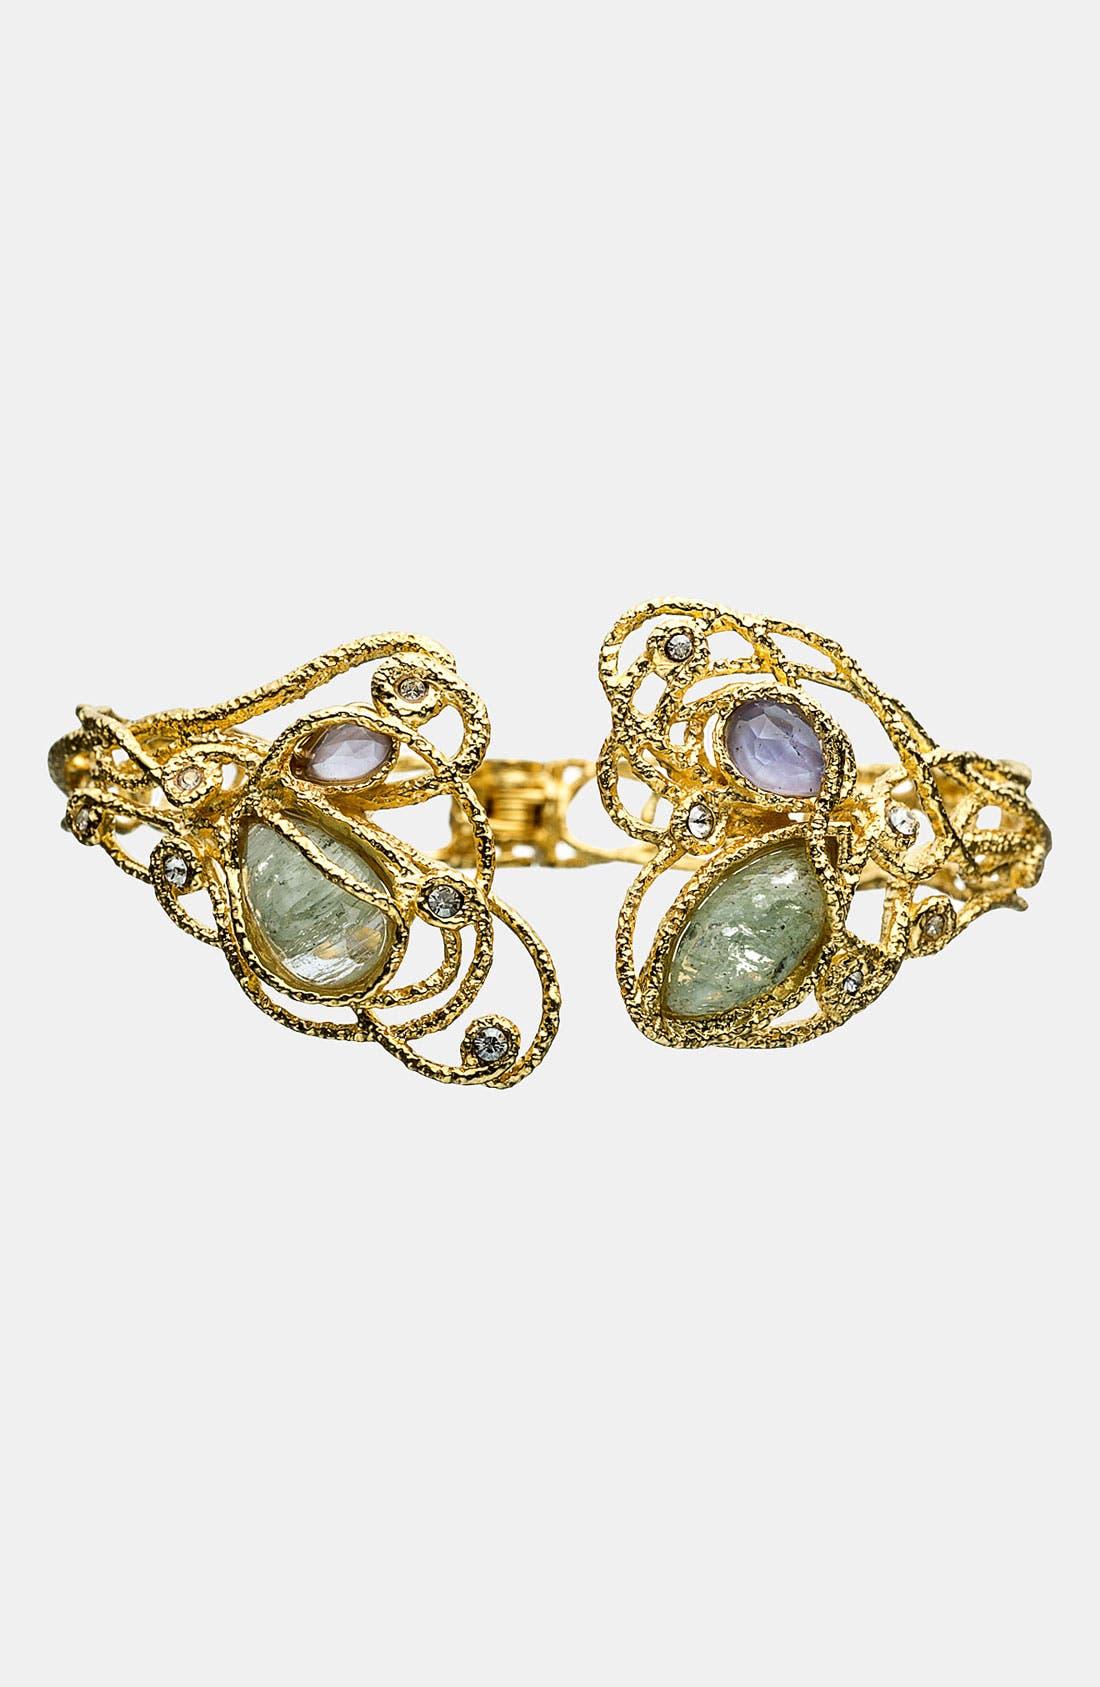 Alternate Image 1 Selected - Alexis Bittar 'Elements - Mauritius' Bracelet